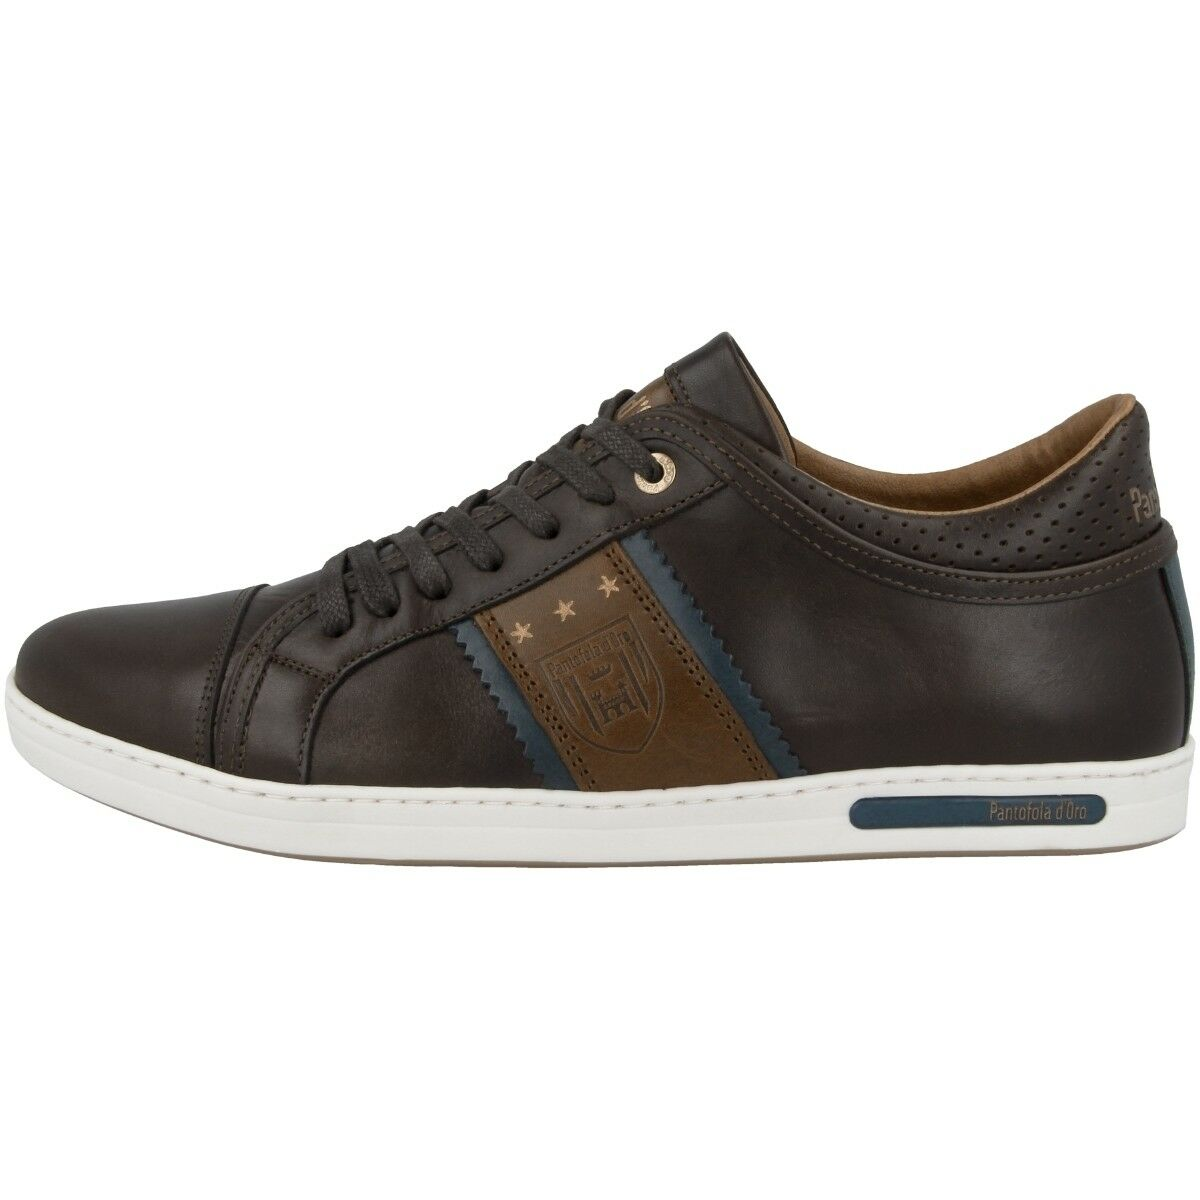 Pantofola d Oro Marinella Uomo Low Schuhe Freizeit Sneaker coffee 10183021.IKU